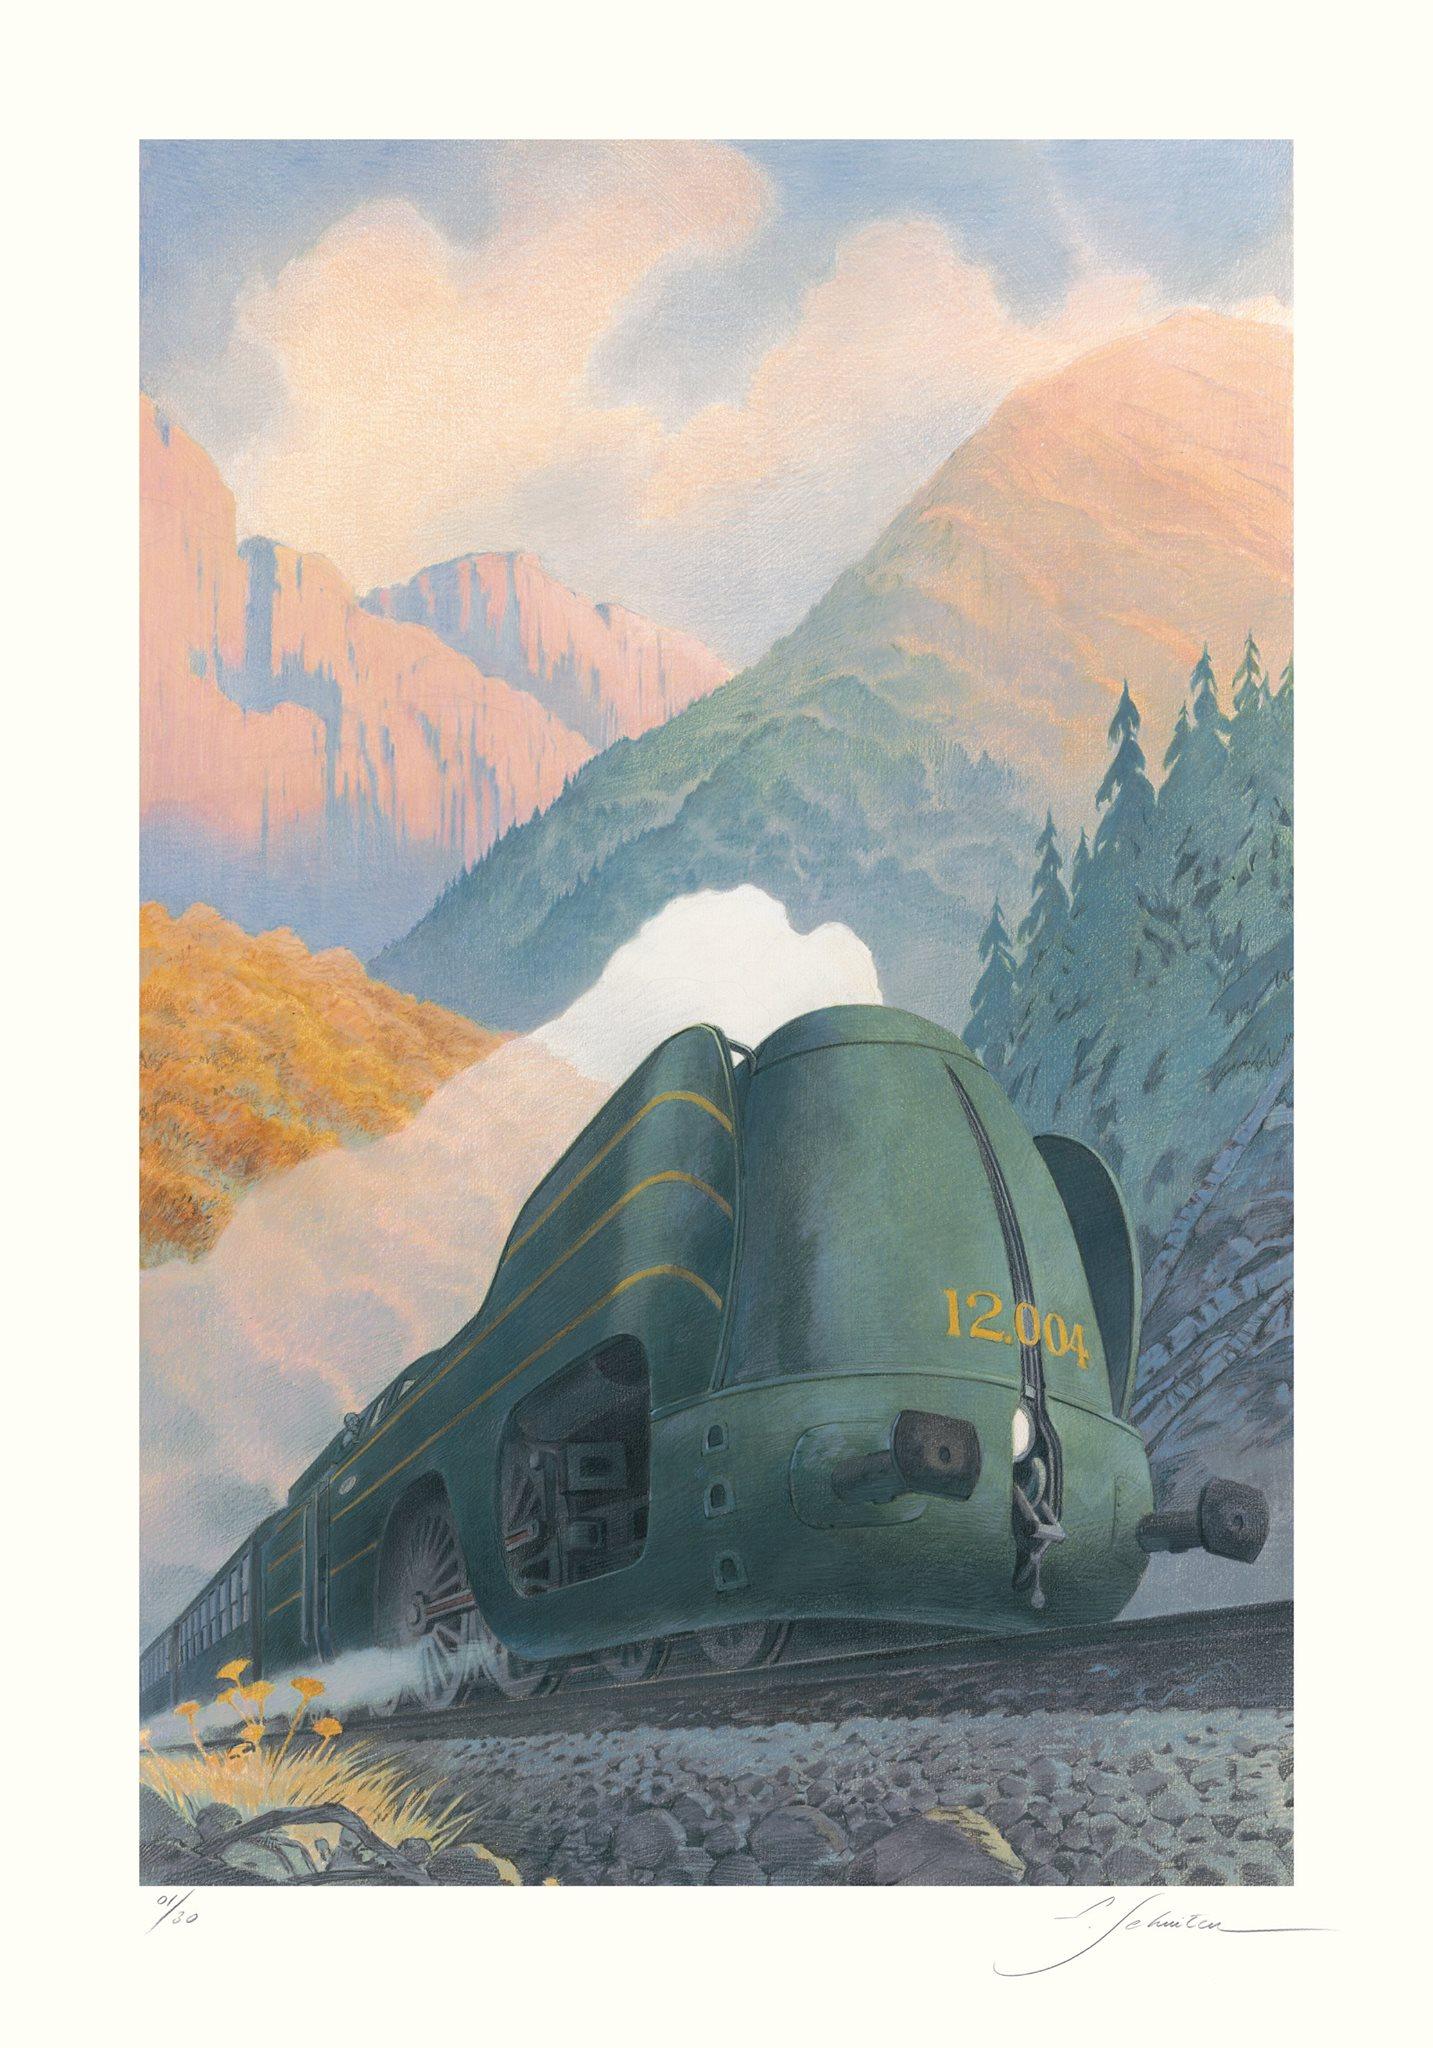 La Type 12 - En montagne by François Schuiten